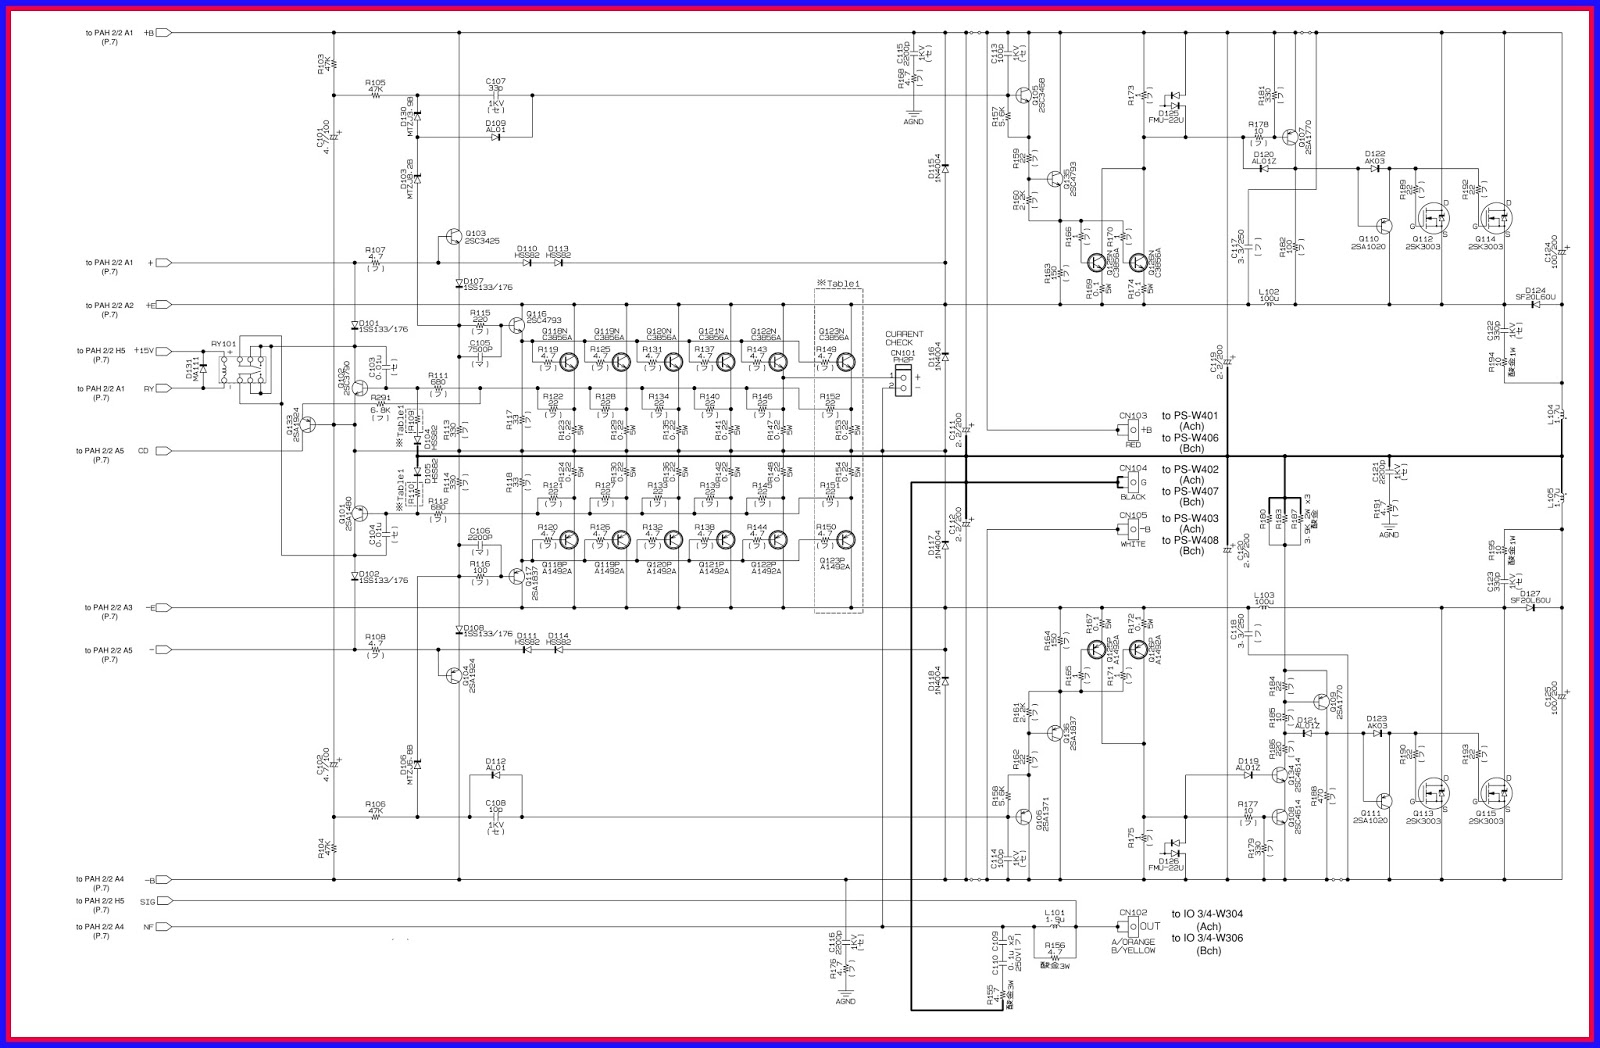 5000 watt amplifier circuit diagram 97 jeep grand cherokee laredo radio wiring watts diagrams library electronic equipment repair centre yamaha xp7000 xp5000 power inspection adjustments and